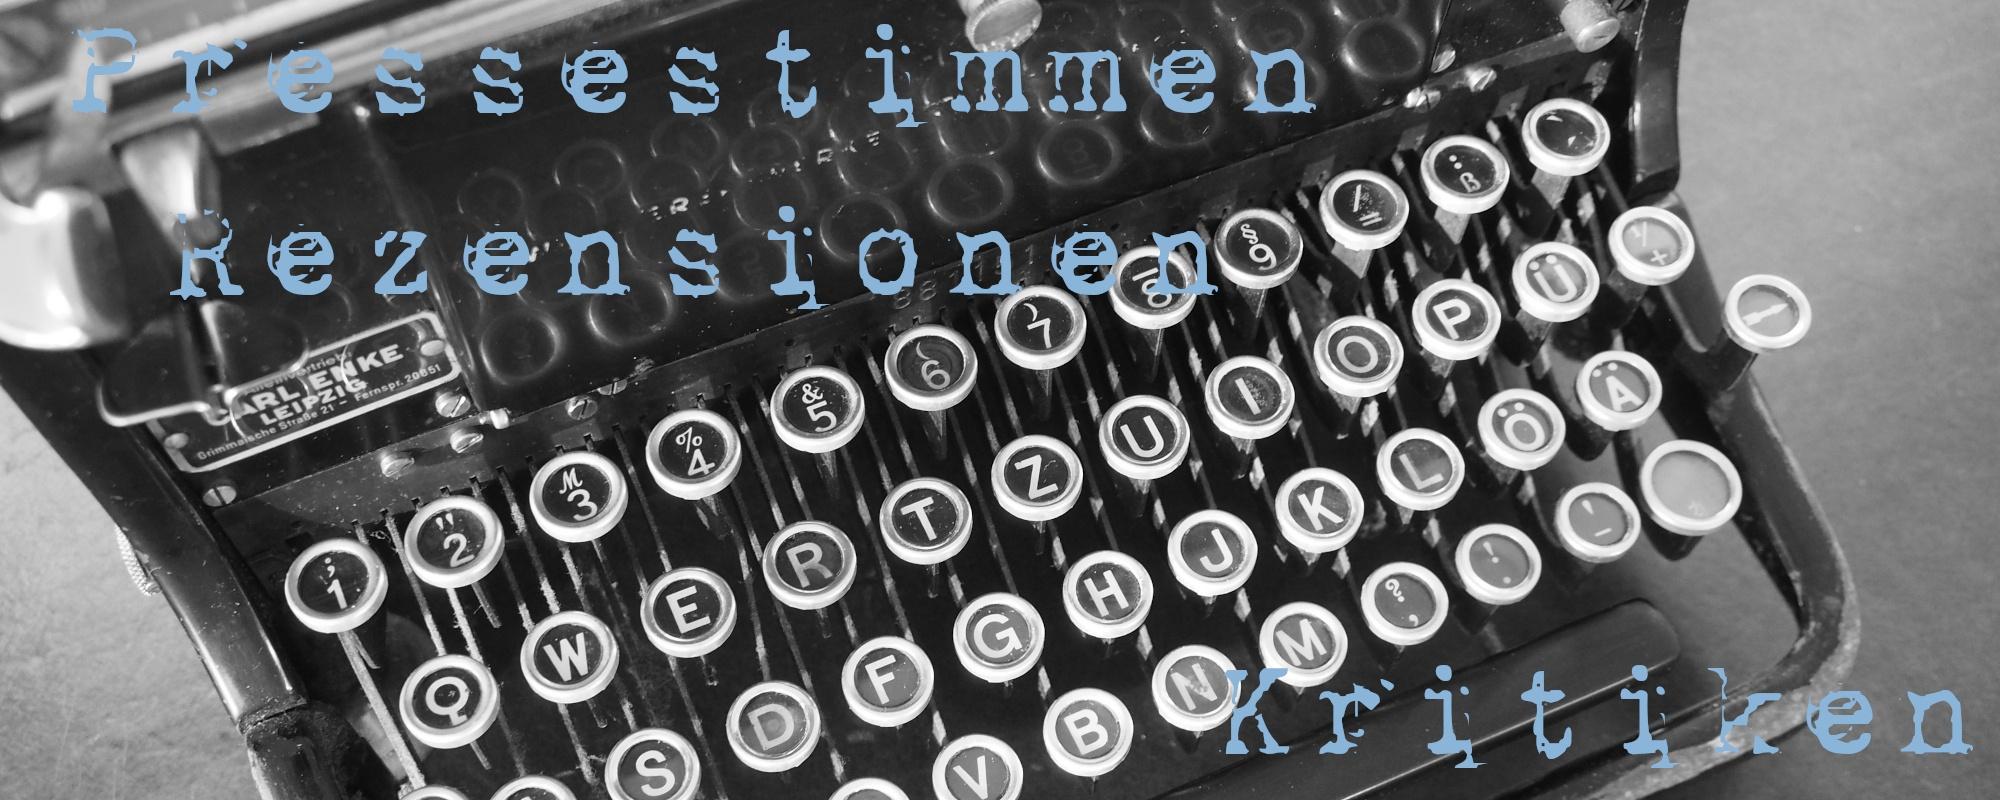 Gerold-Tietz-Schriftsteller-Pressestimmen-Rezensionen-Kritiken-Buecher-Texte